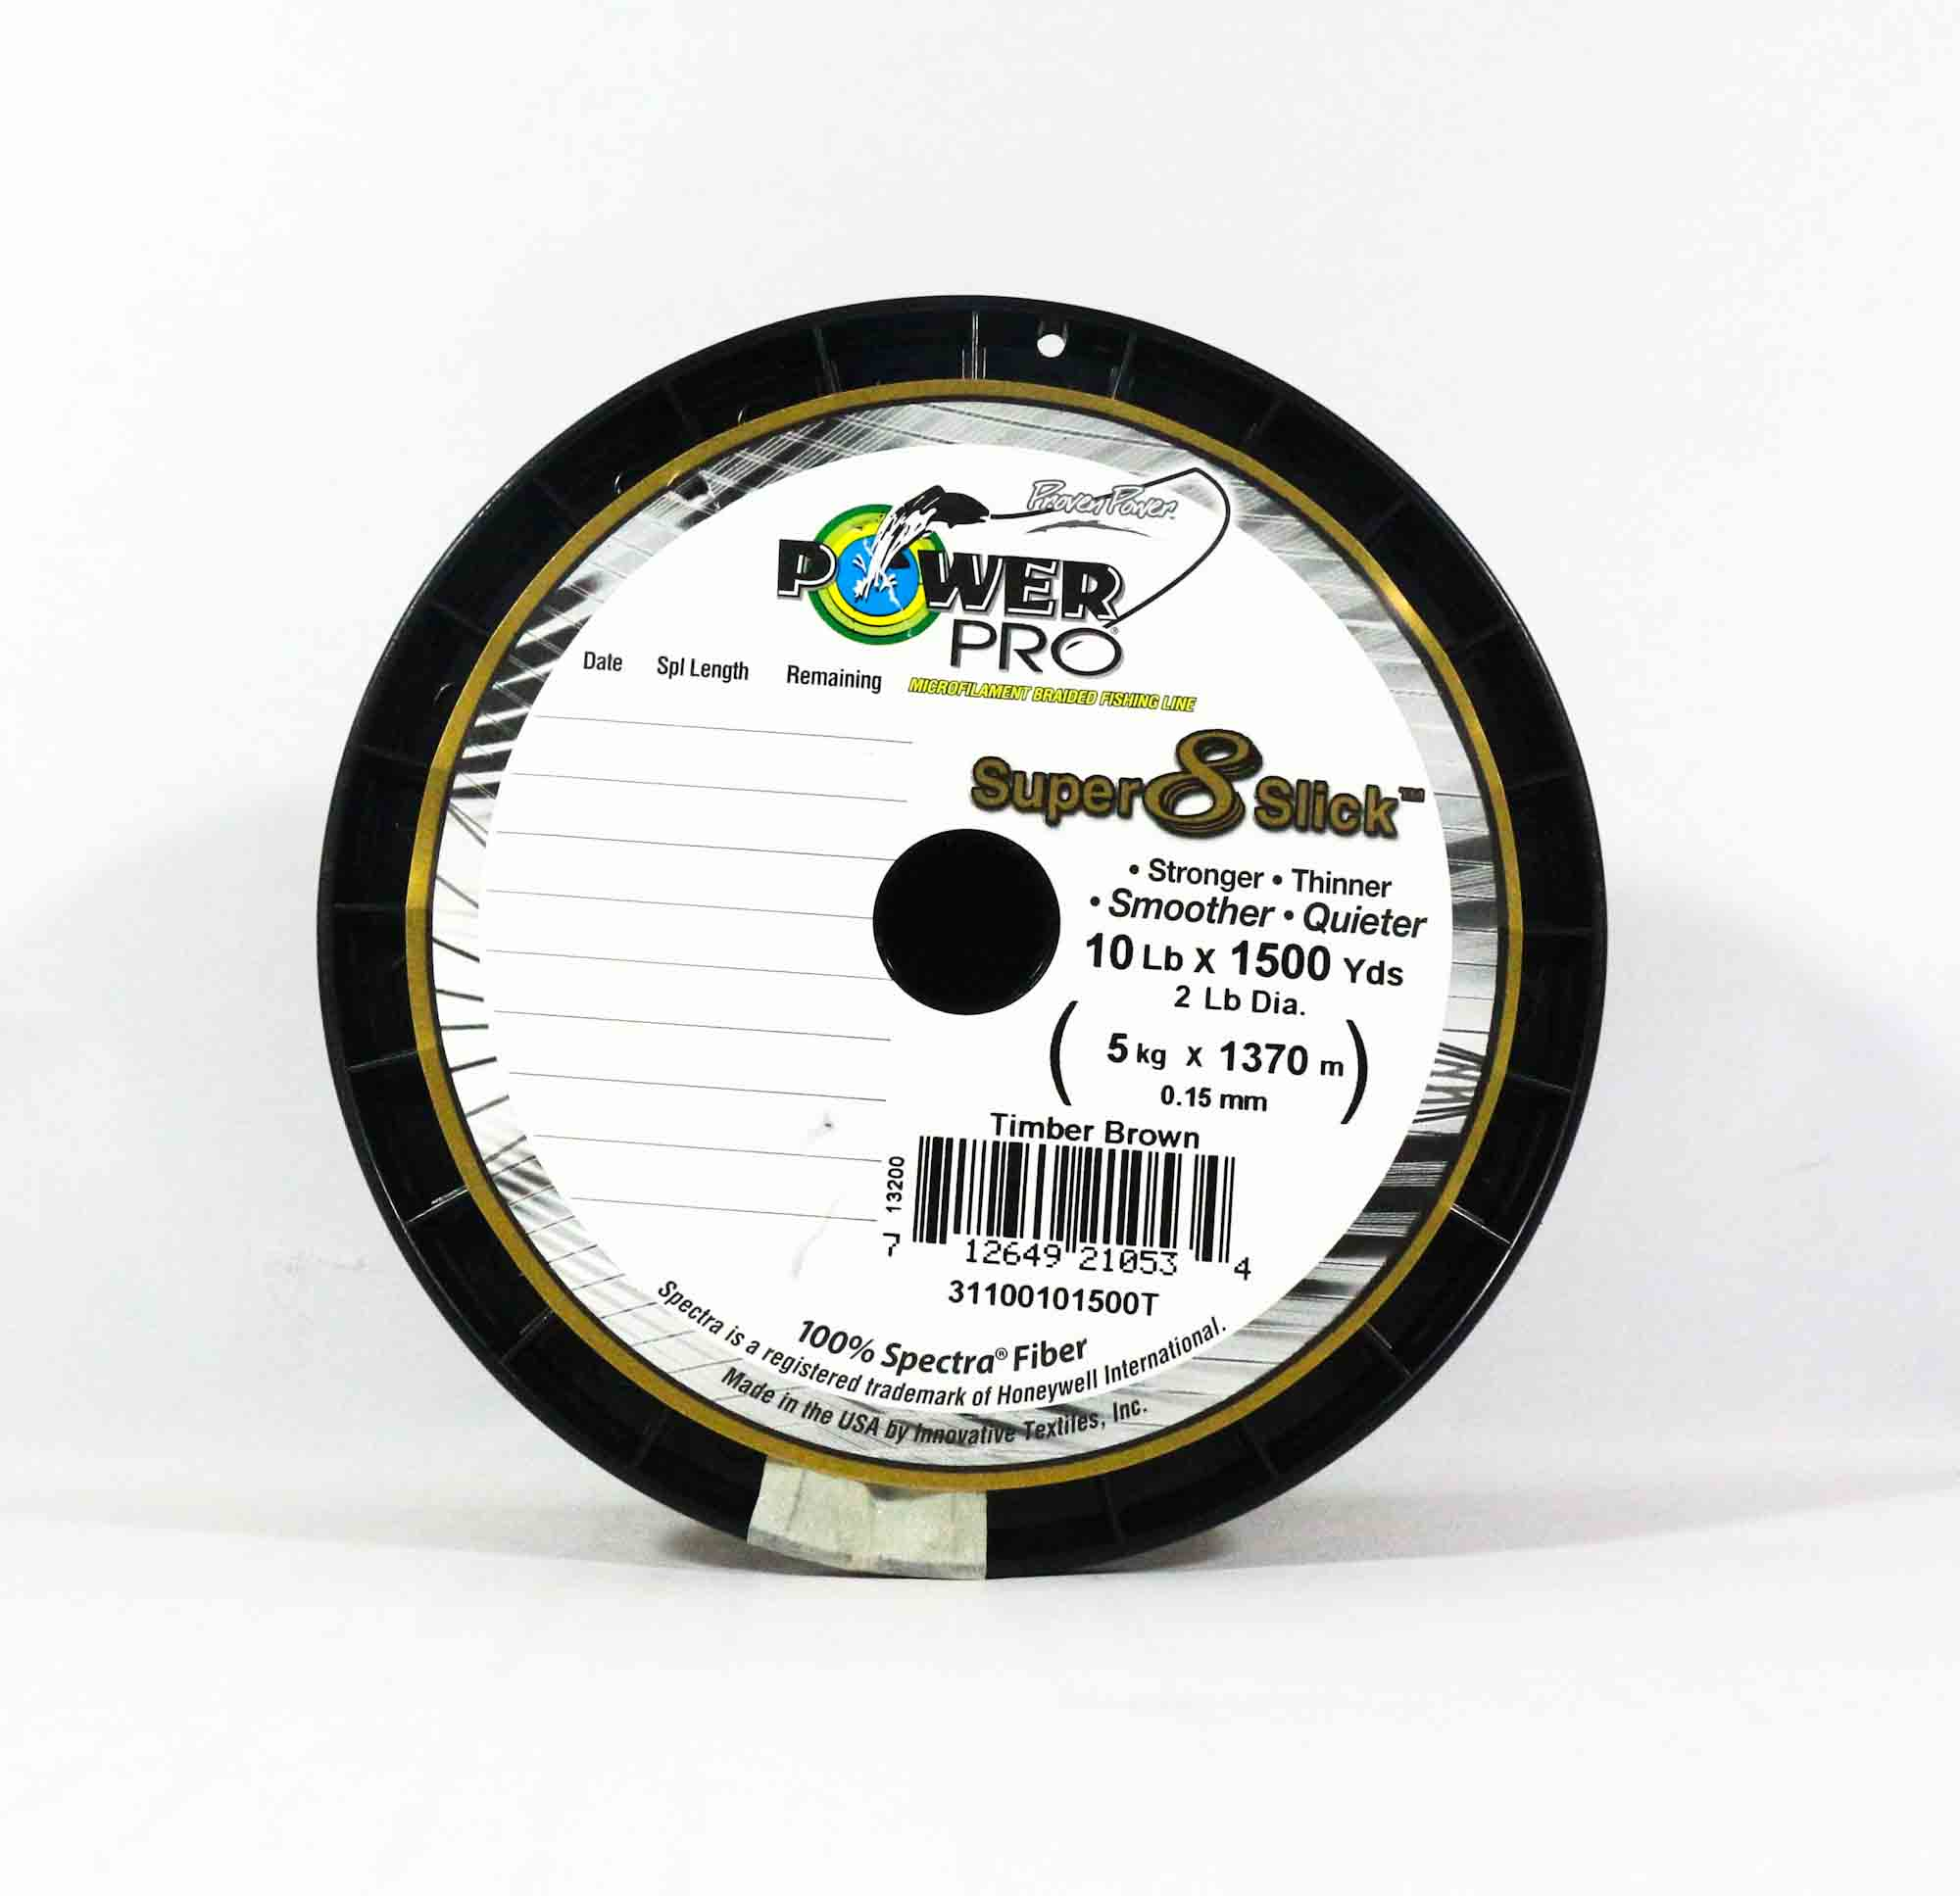 Power Pro Super 8 Slick Spectra Line 10lb by 1500yds Brown (0534)